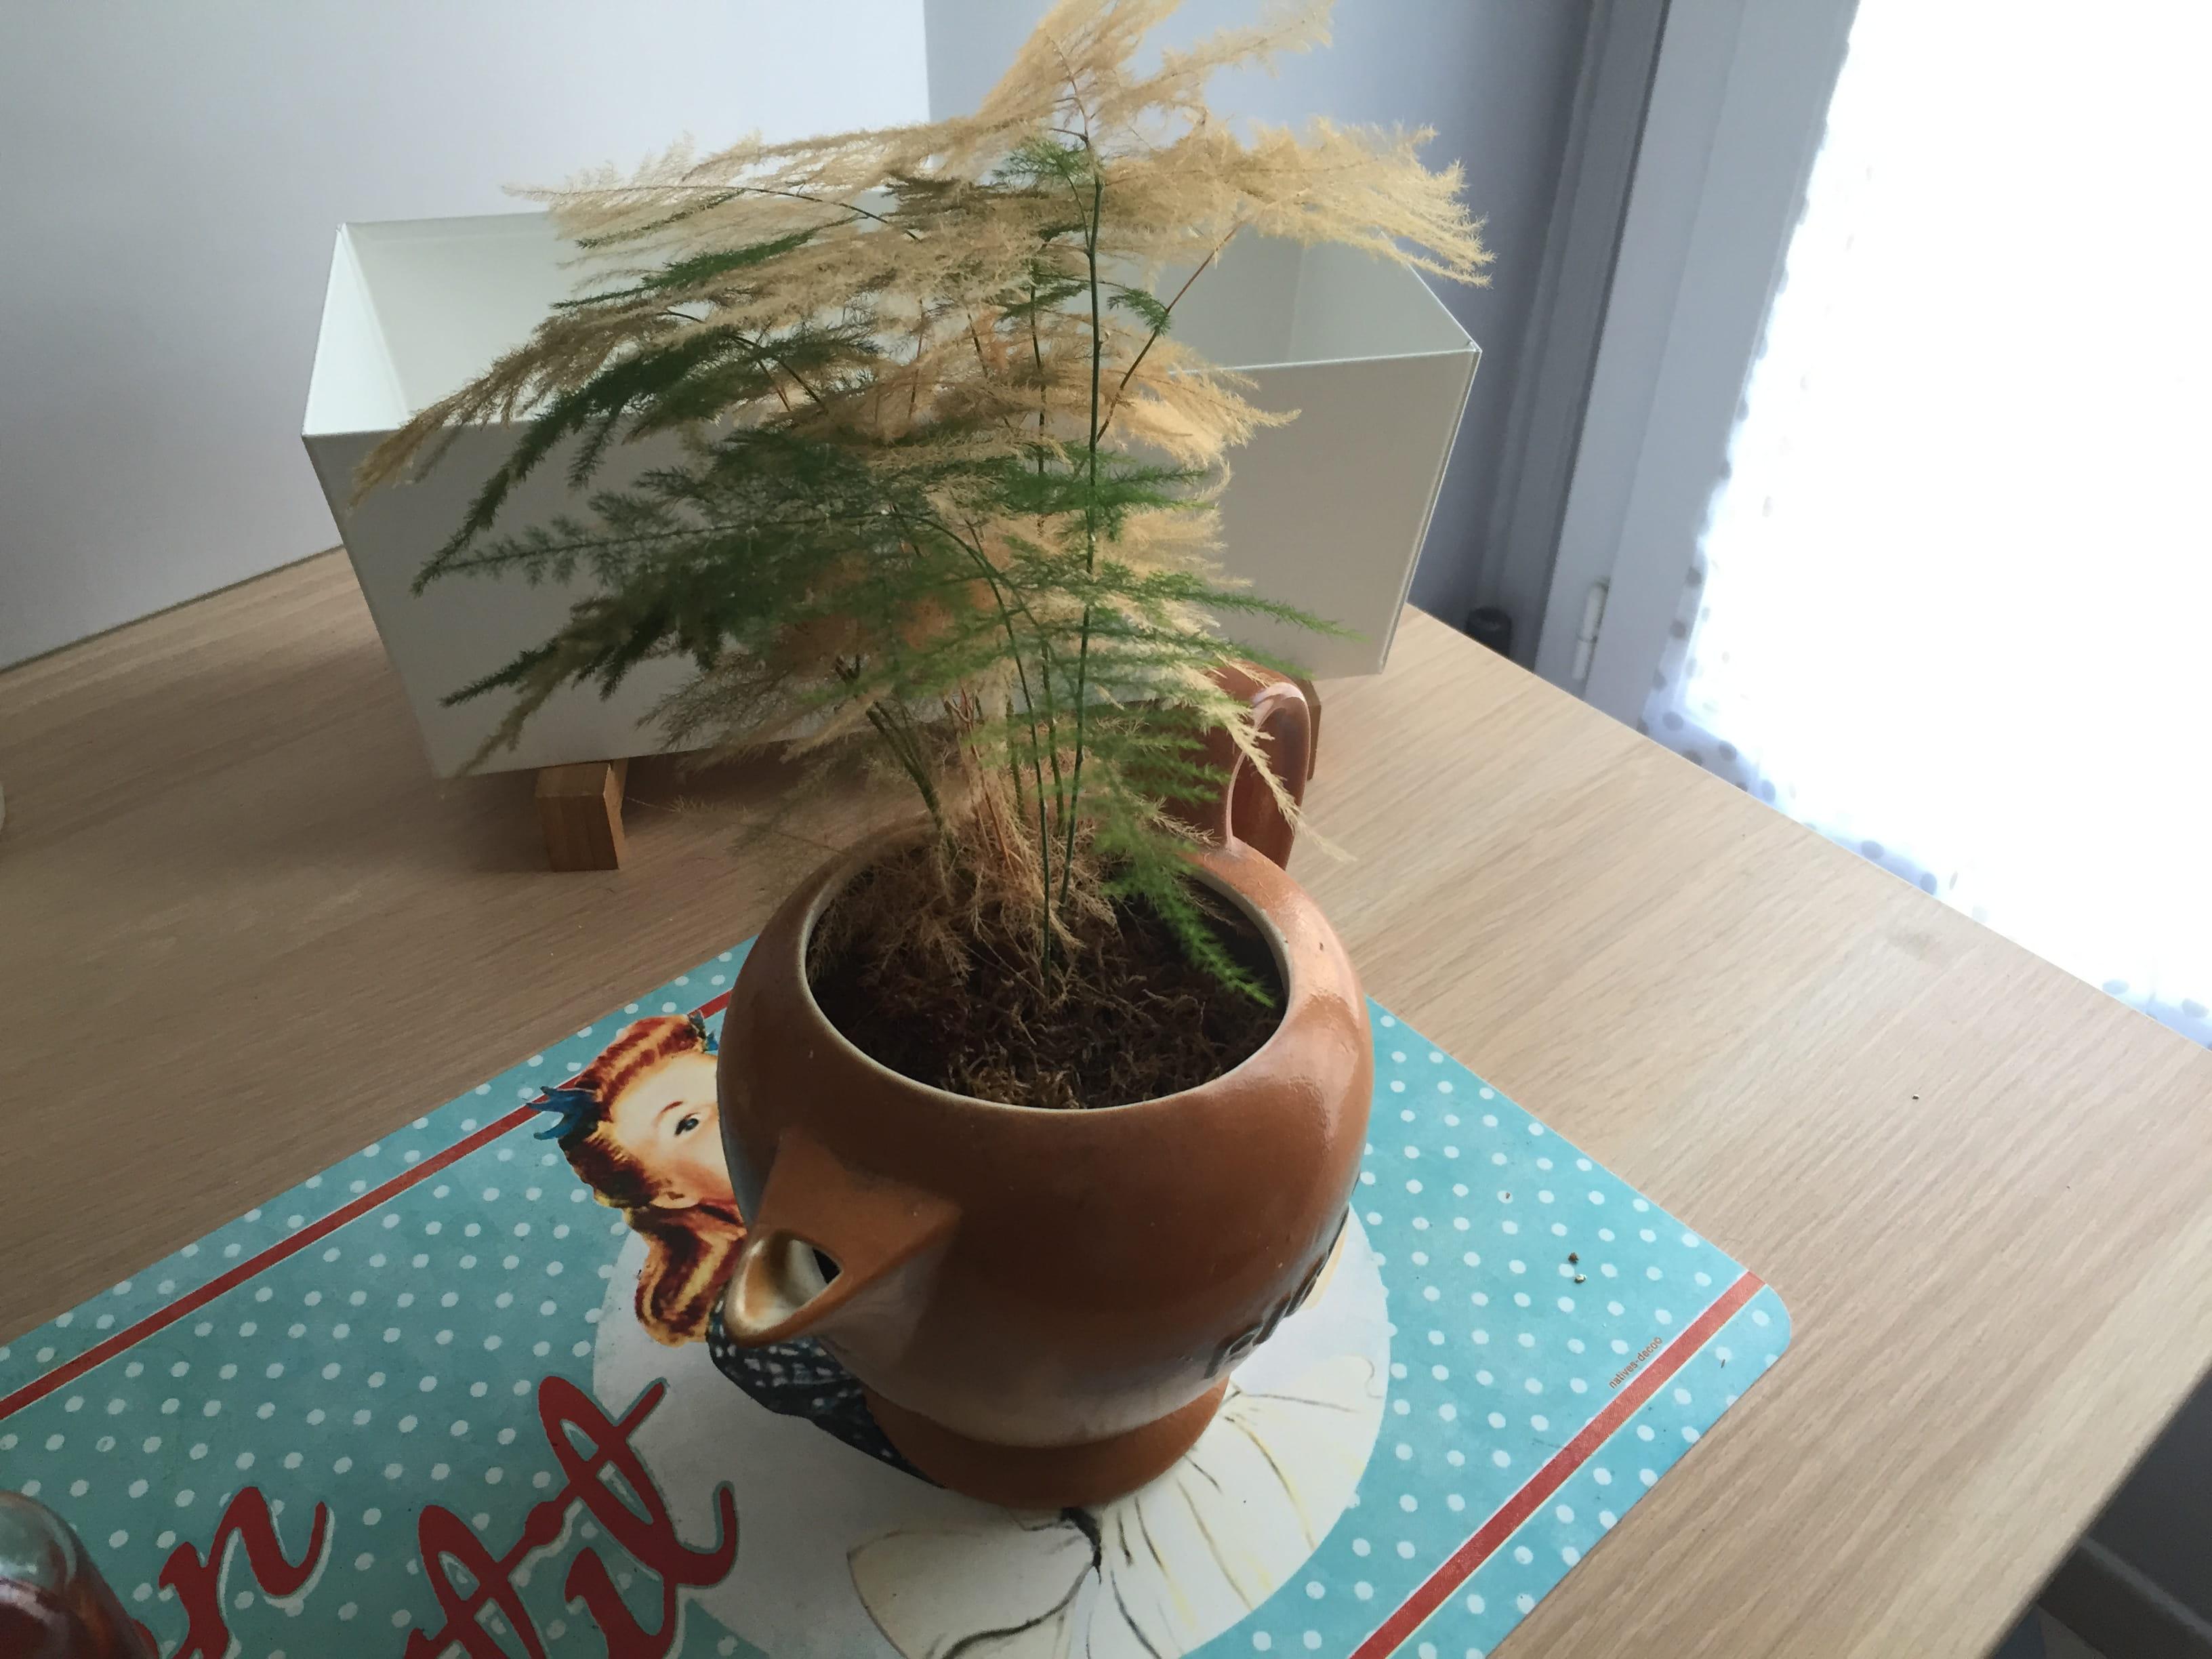 Ma plante devient jaune [Résolu]